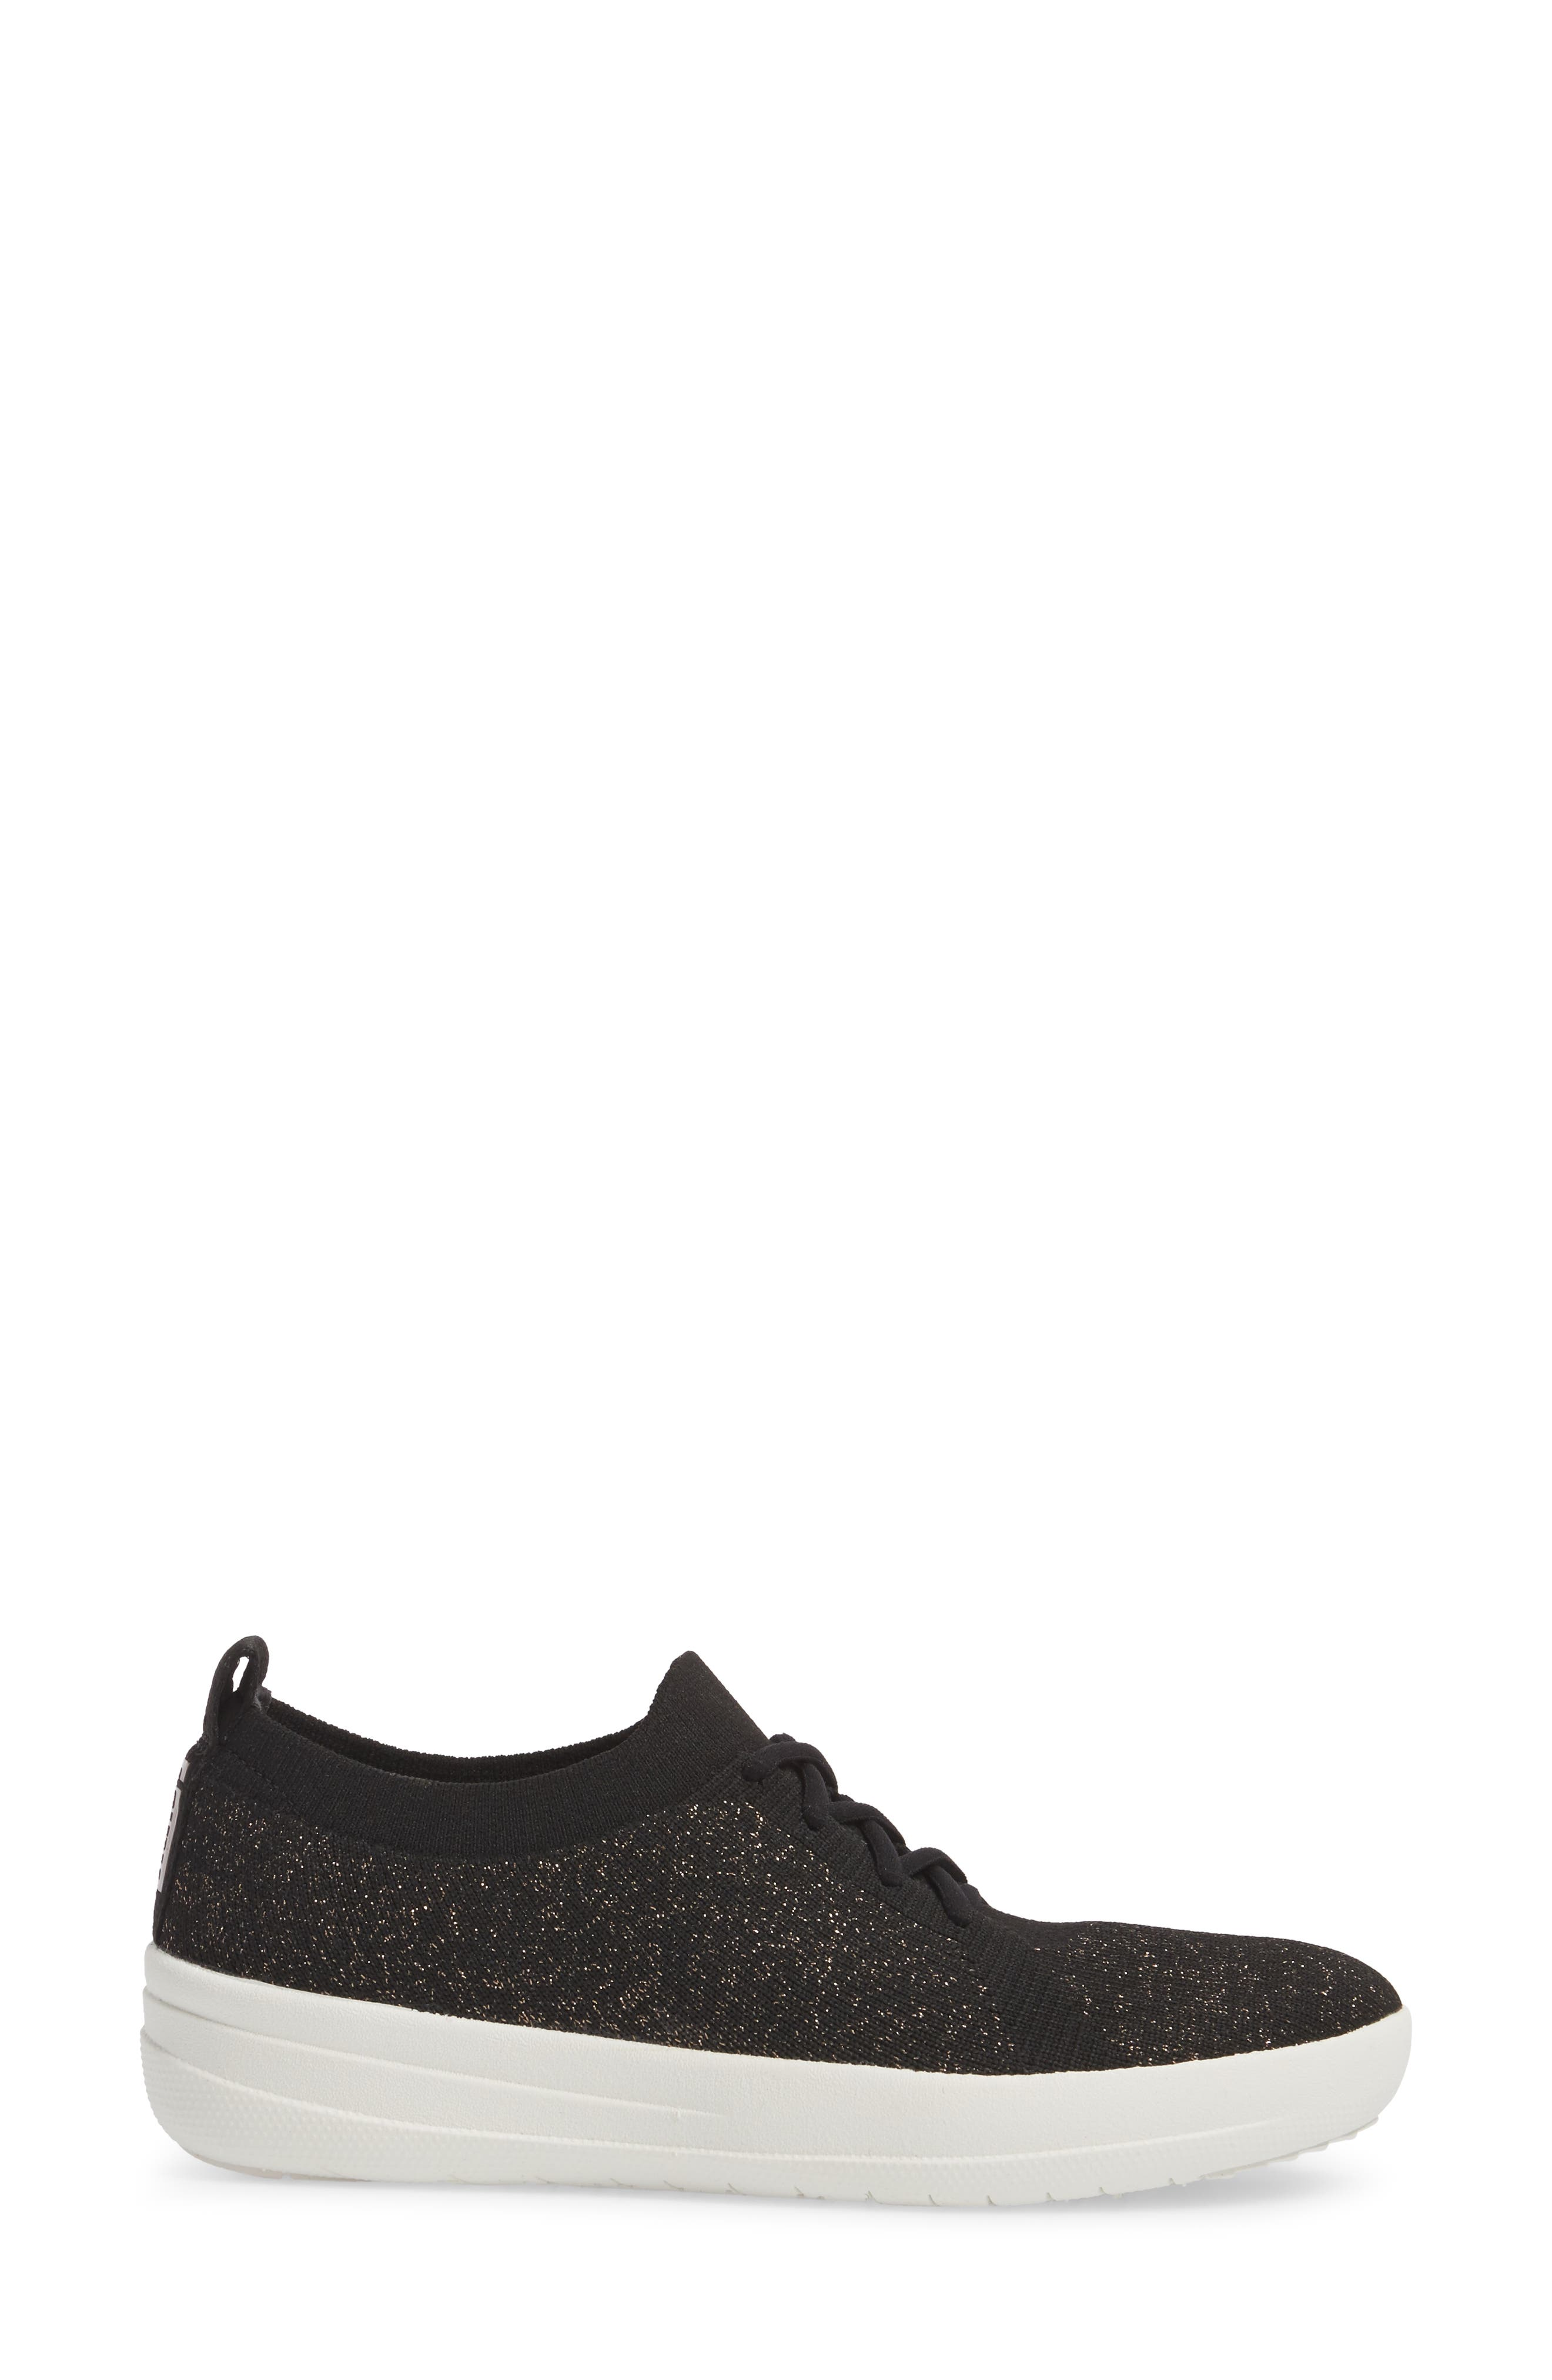 Uberknit<sup>™</sup> F-Sporty Sneaker,                             Alternate thumbnail 3, color,                             BLACK FABRIC